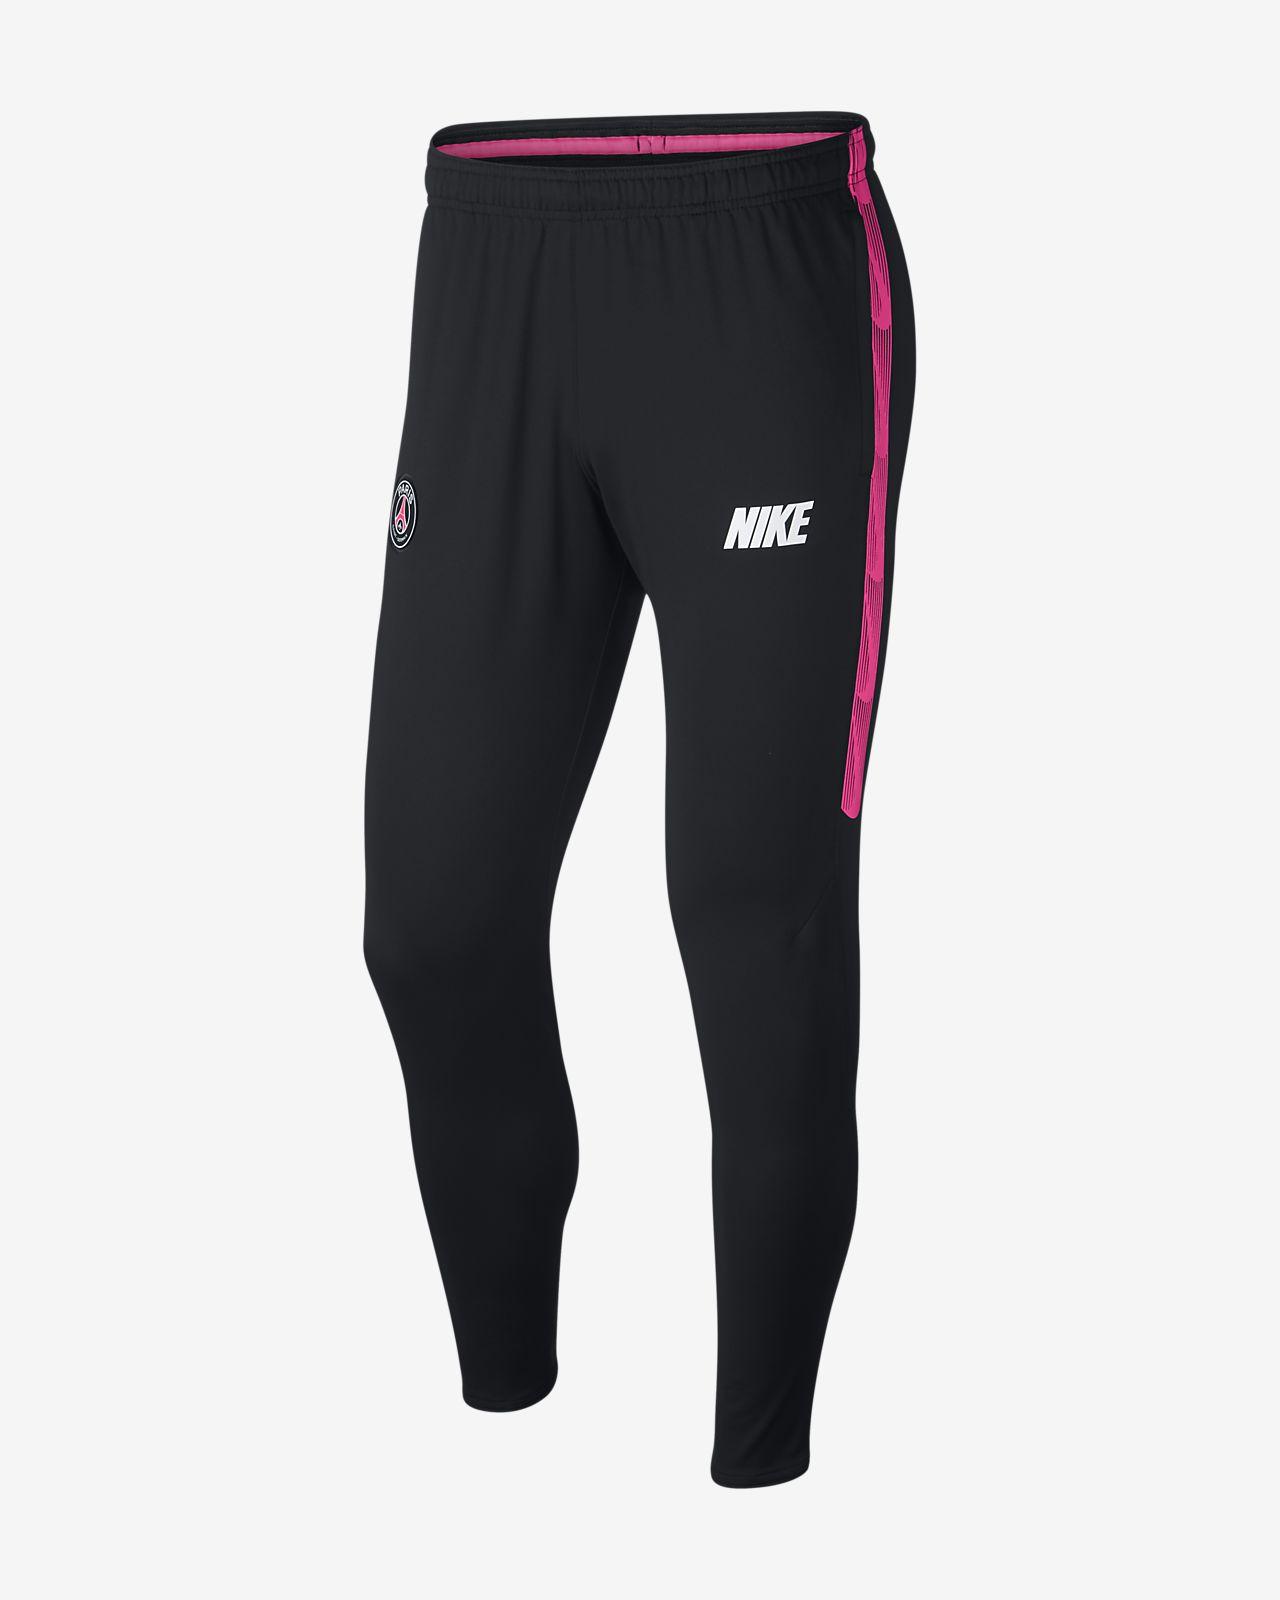 Paris Saint-Germain Dri-FIT Squad Pantalón de fútbol - Hombre. Nike ... 7031e040883